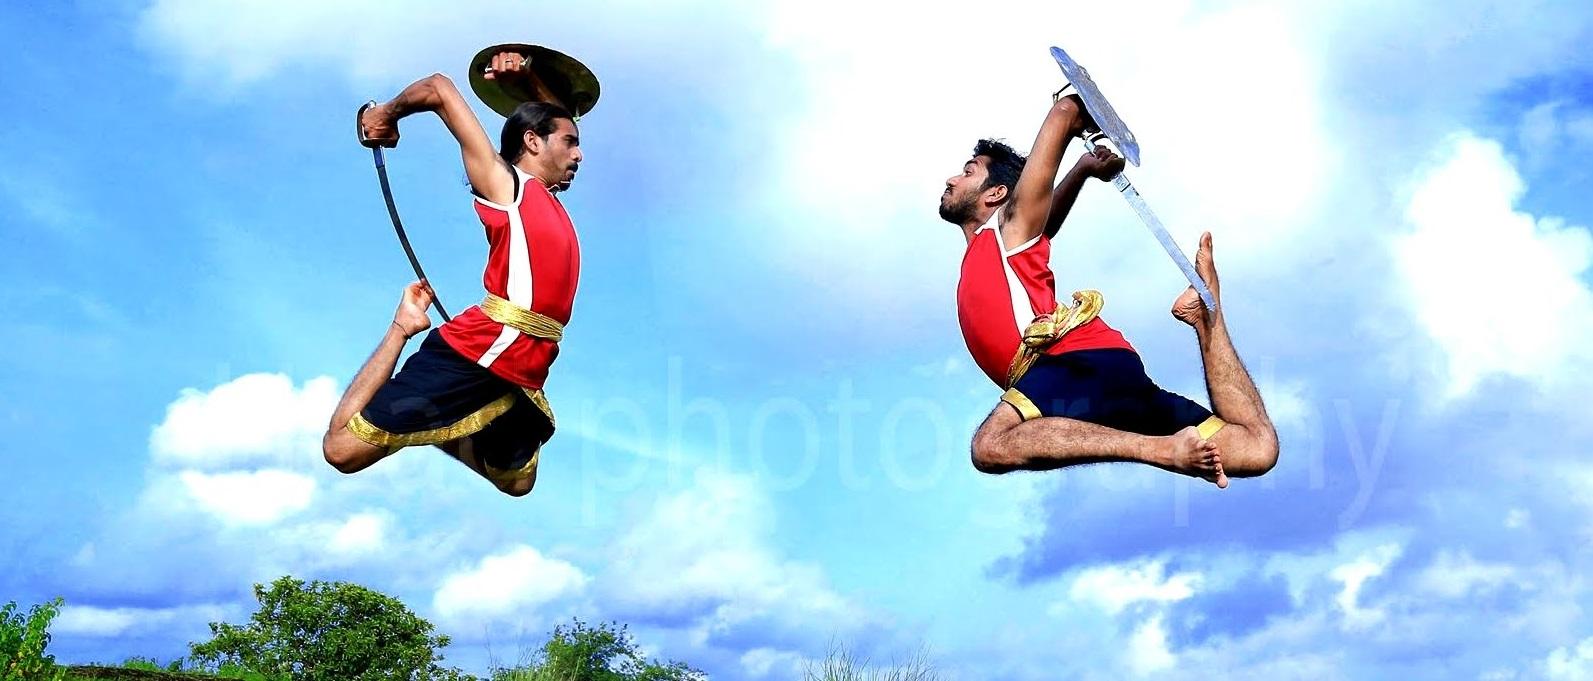 Traditional Indian Martial Arts 印度傳統武術:卡拉里帕亞特